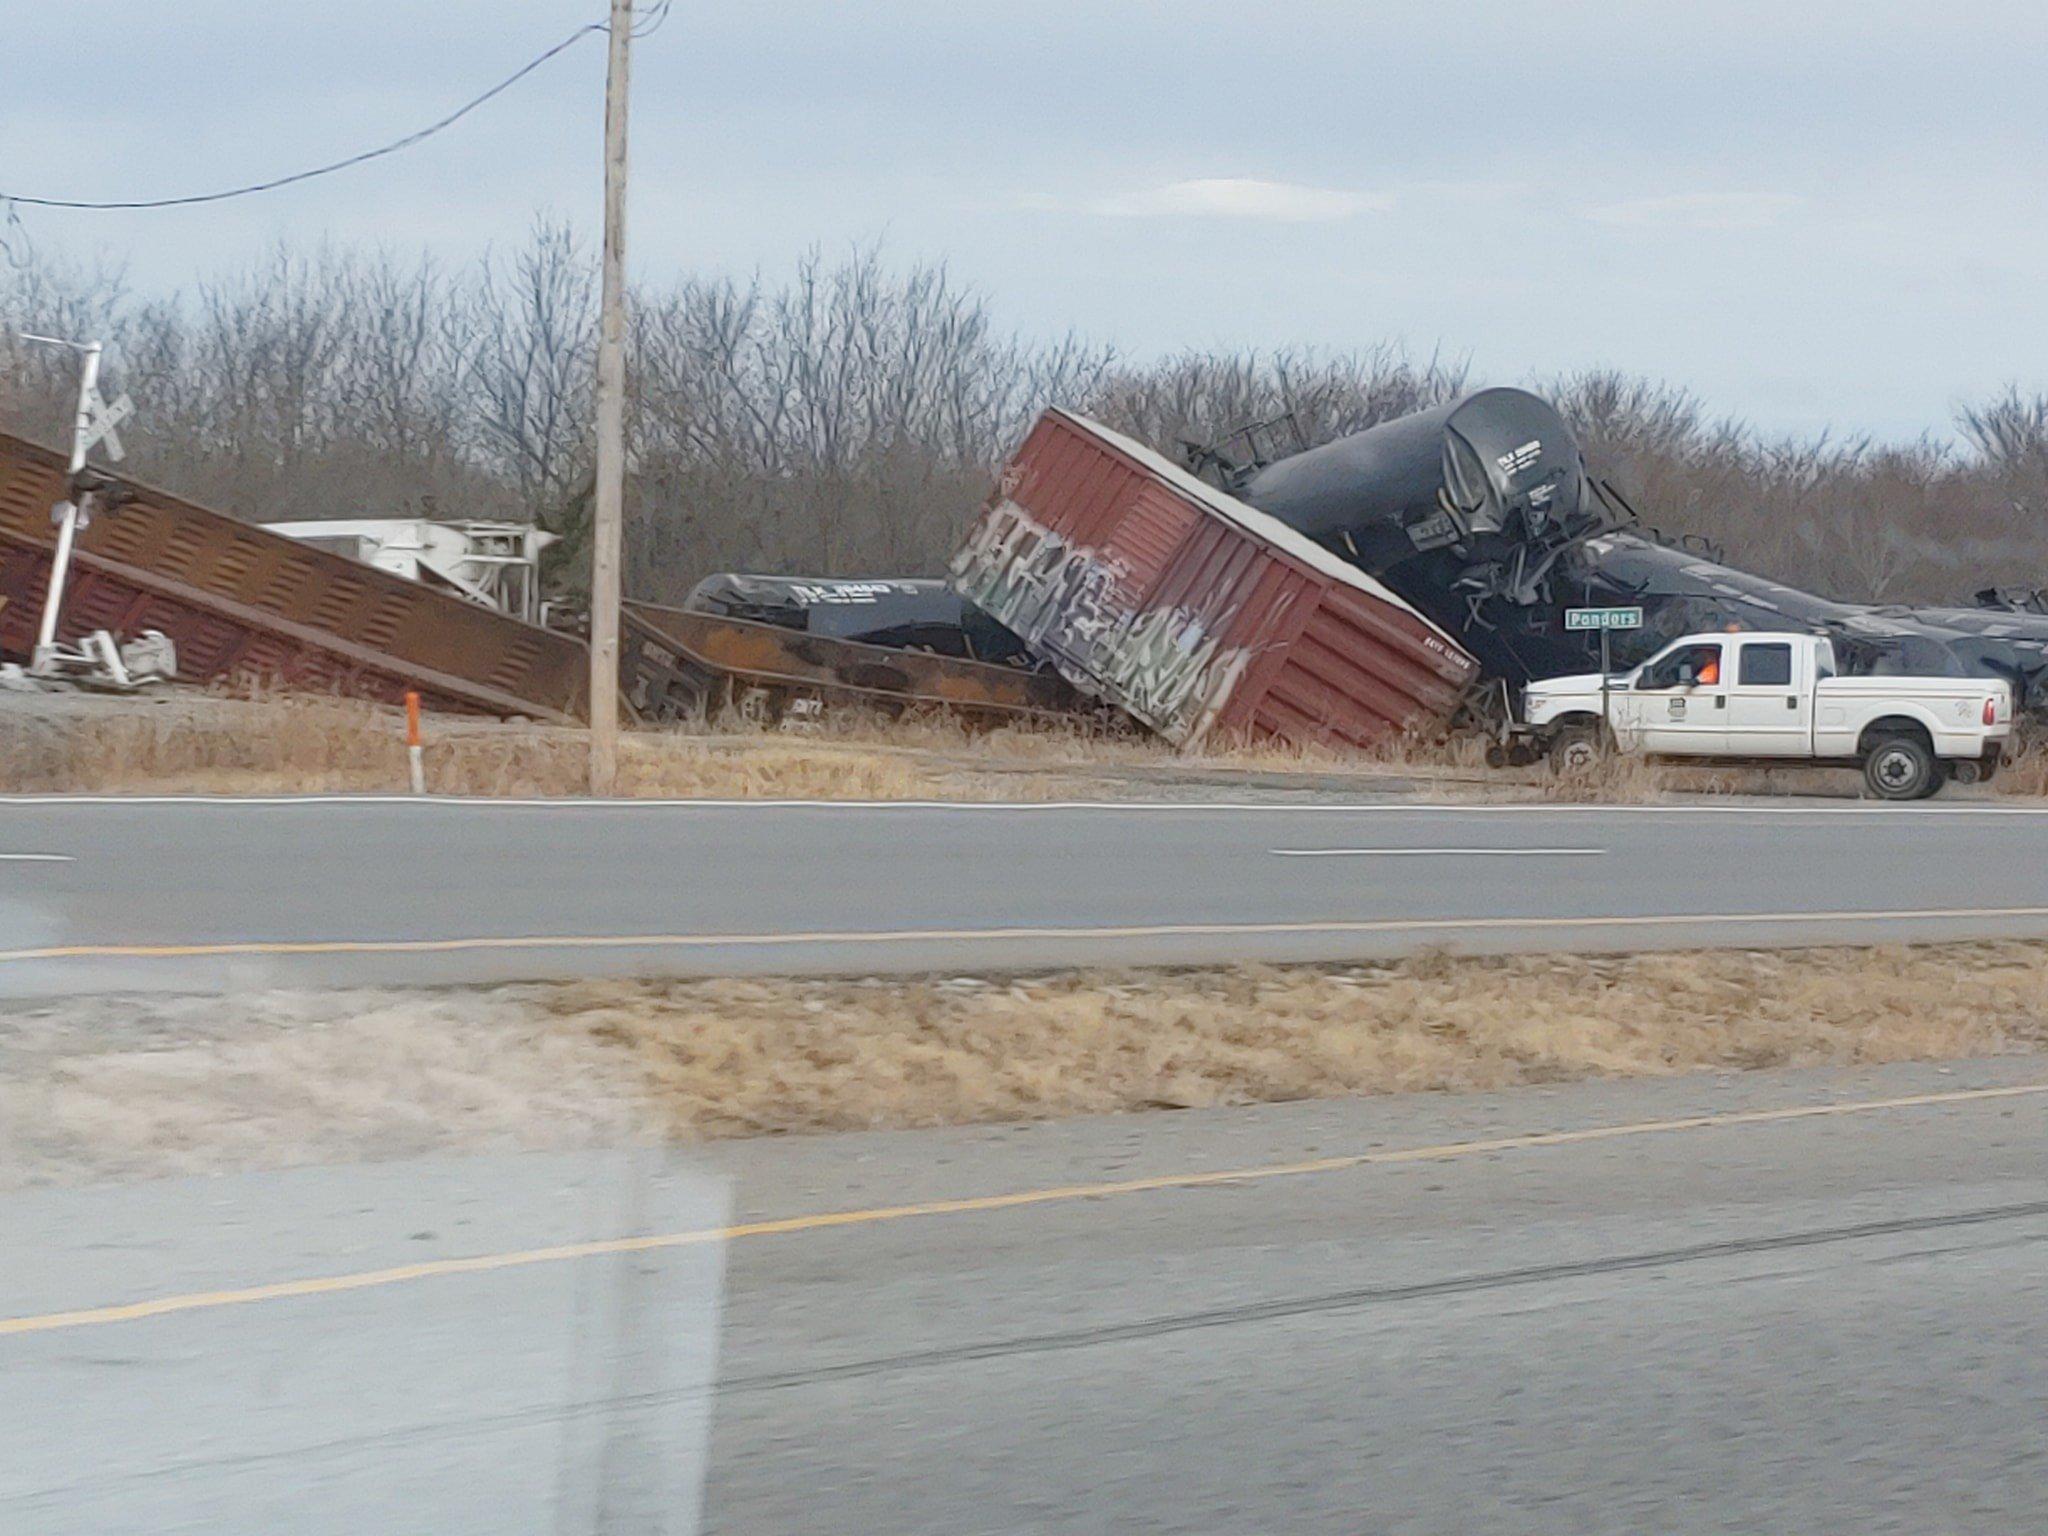 A Union Pacific Train derailed north of Kiowa, Ok on Sunday morning. (KTEN)